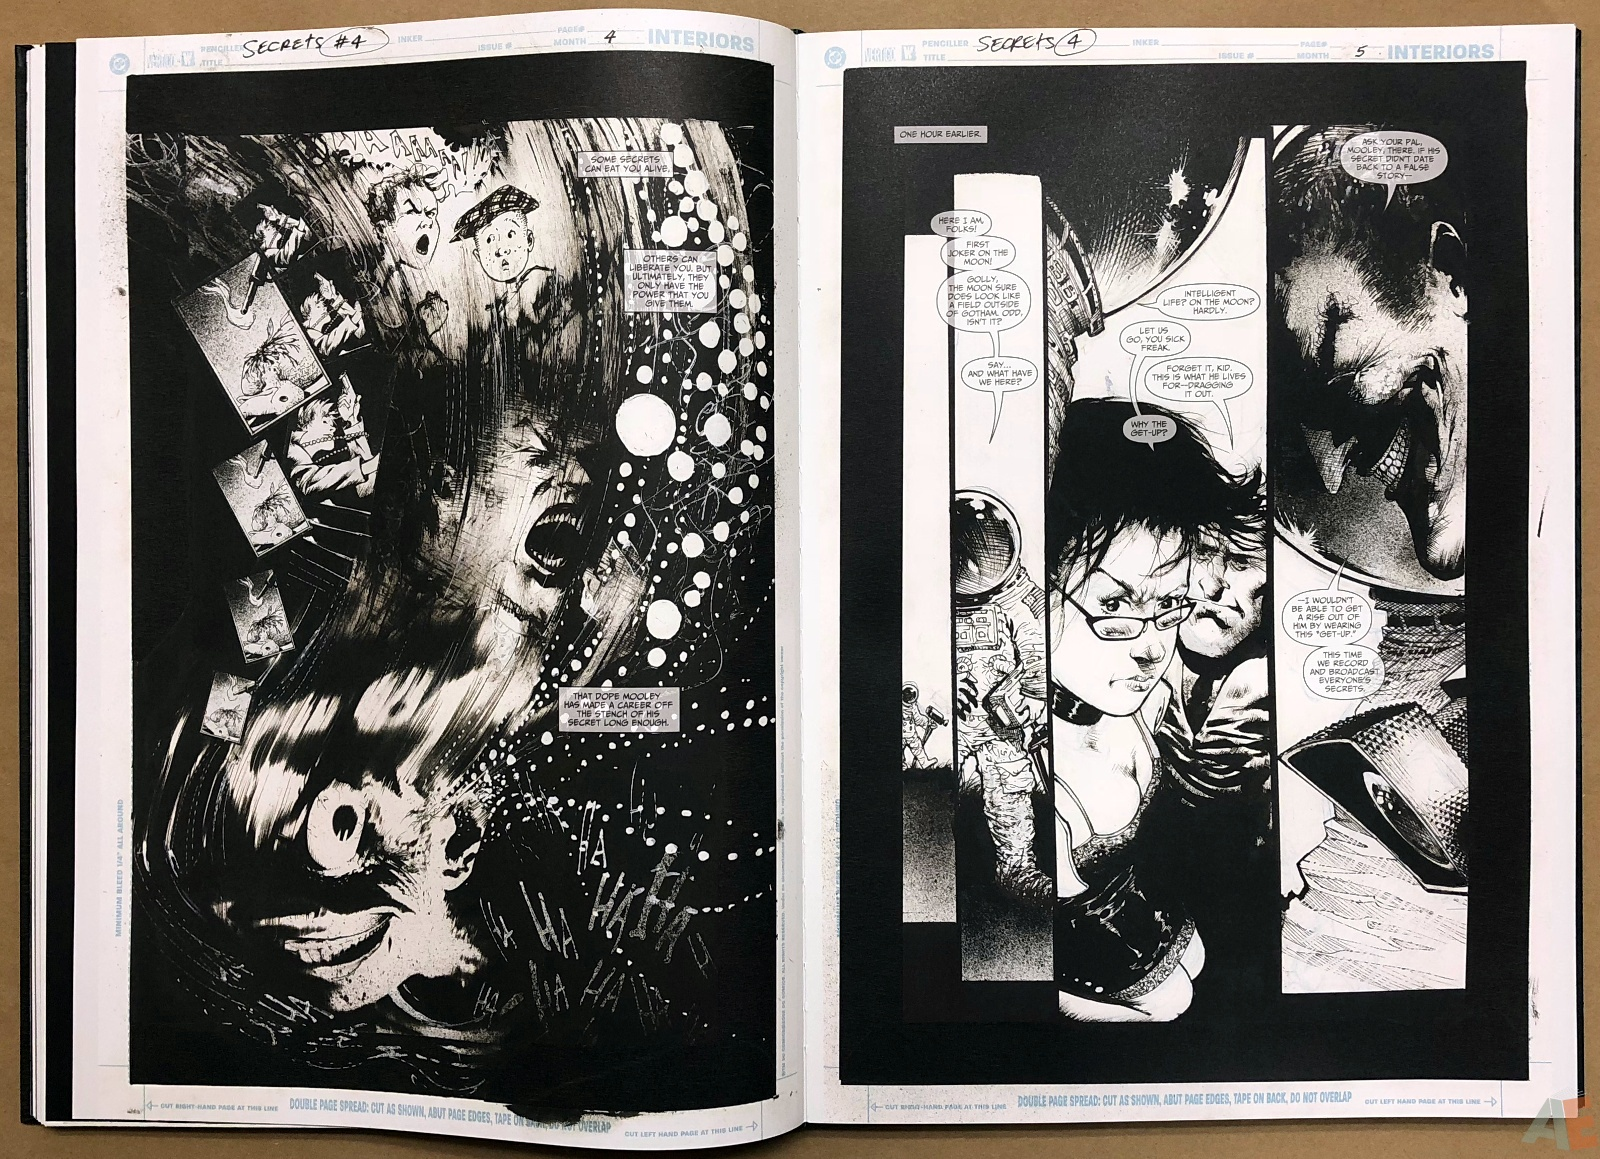 Batman: Secrets – Sam Kieth Gallery Edition 23